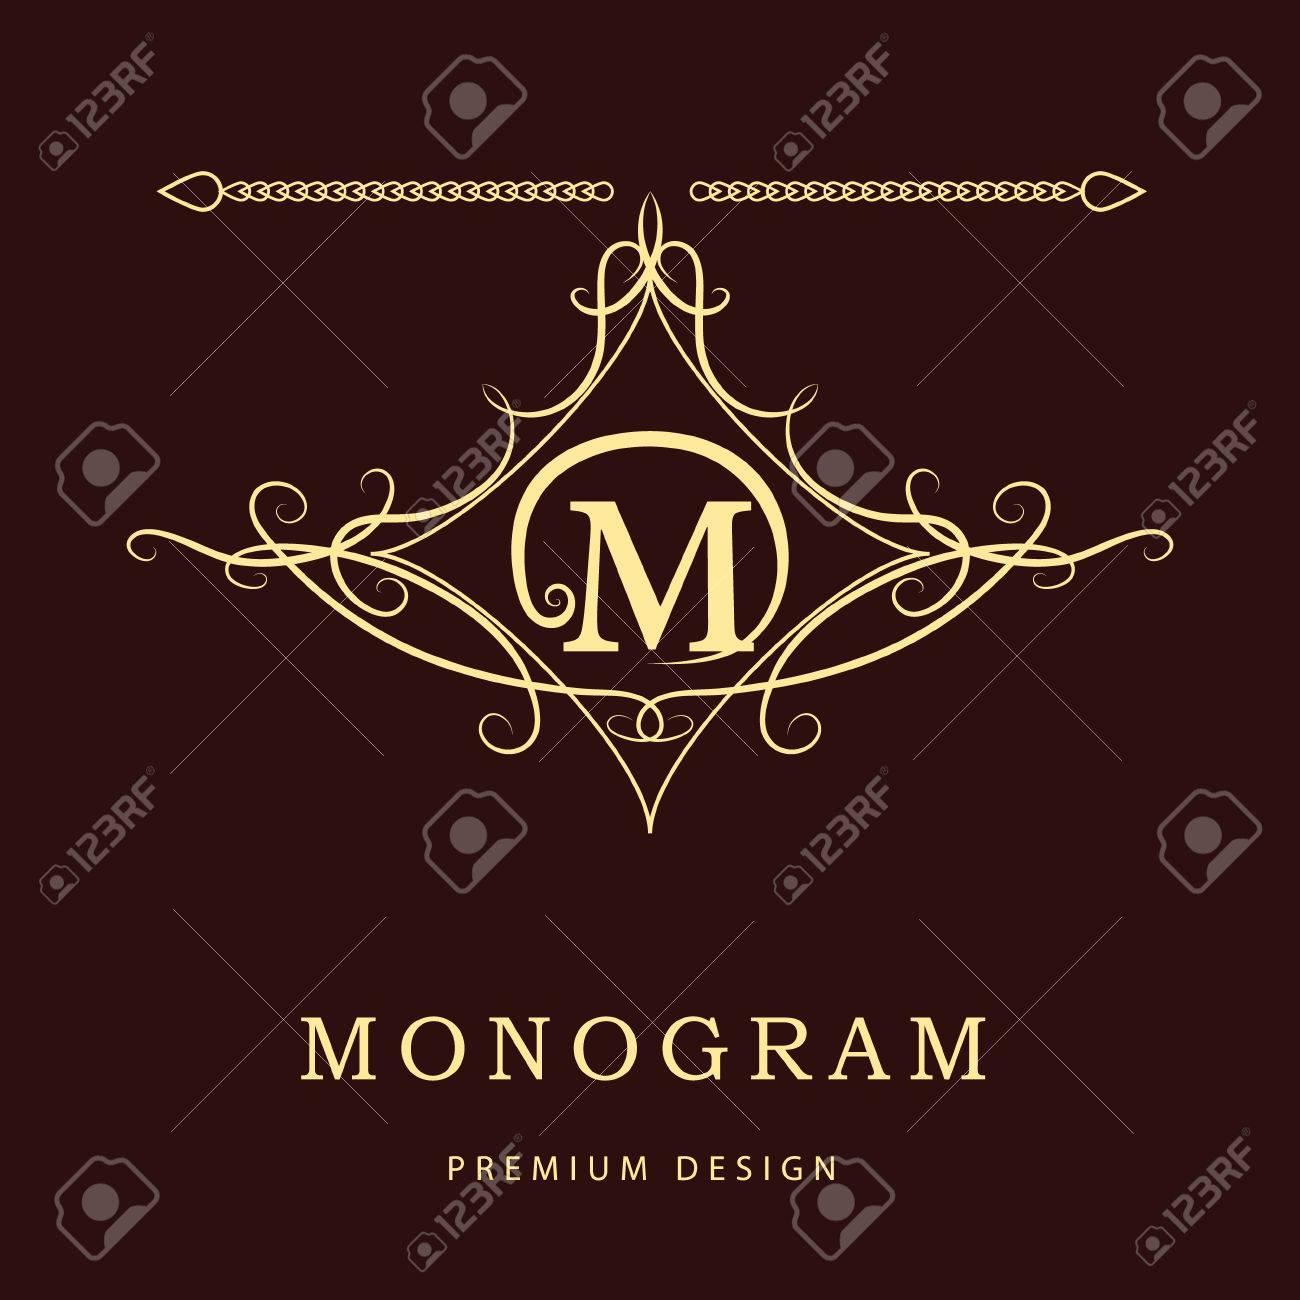 Tj initial luxury ornament monogram logo stock vector - Vintage Monogram M Monogram Design Elements Graceful Template Elegant Line Art Icon Design